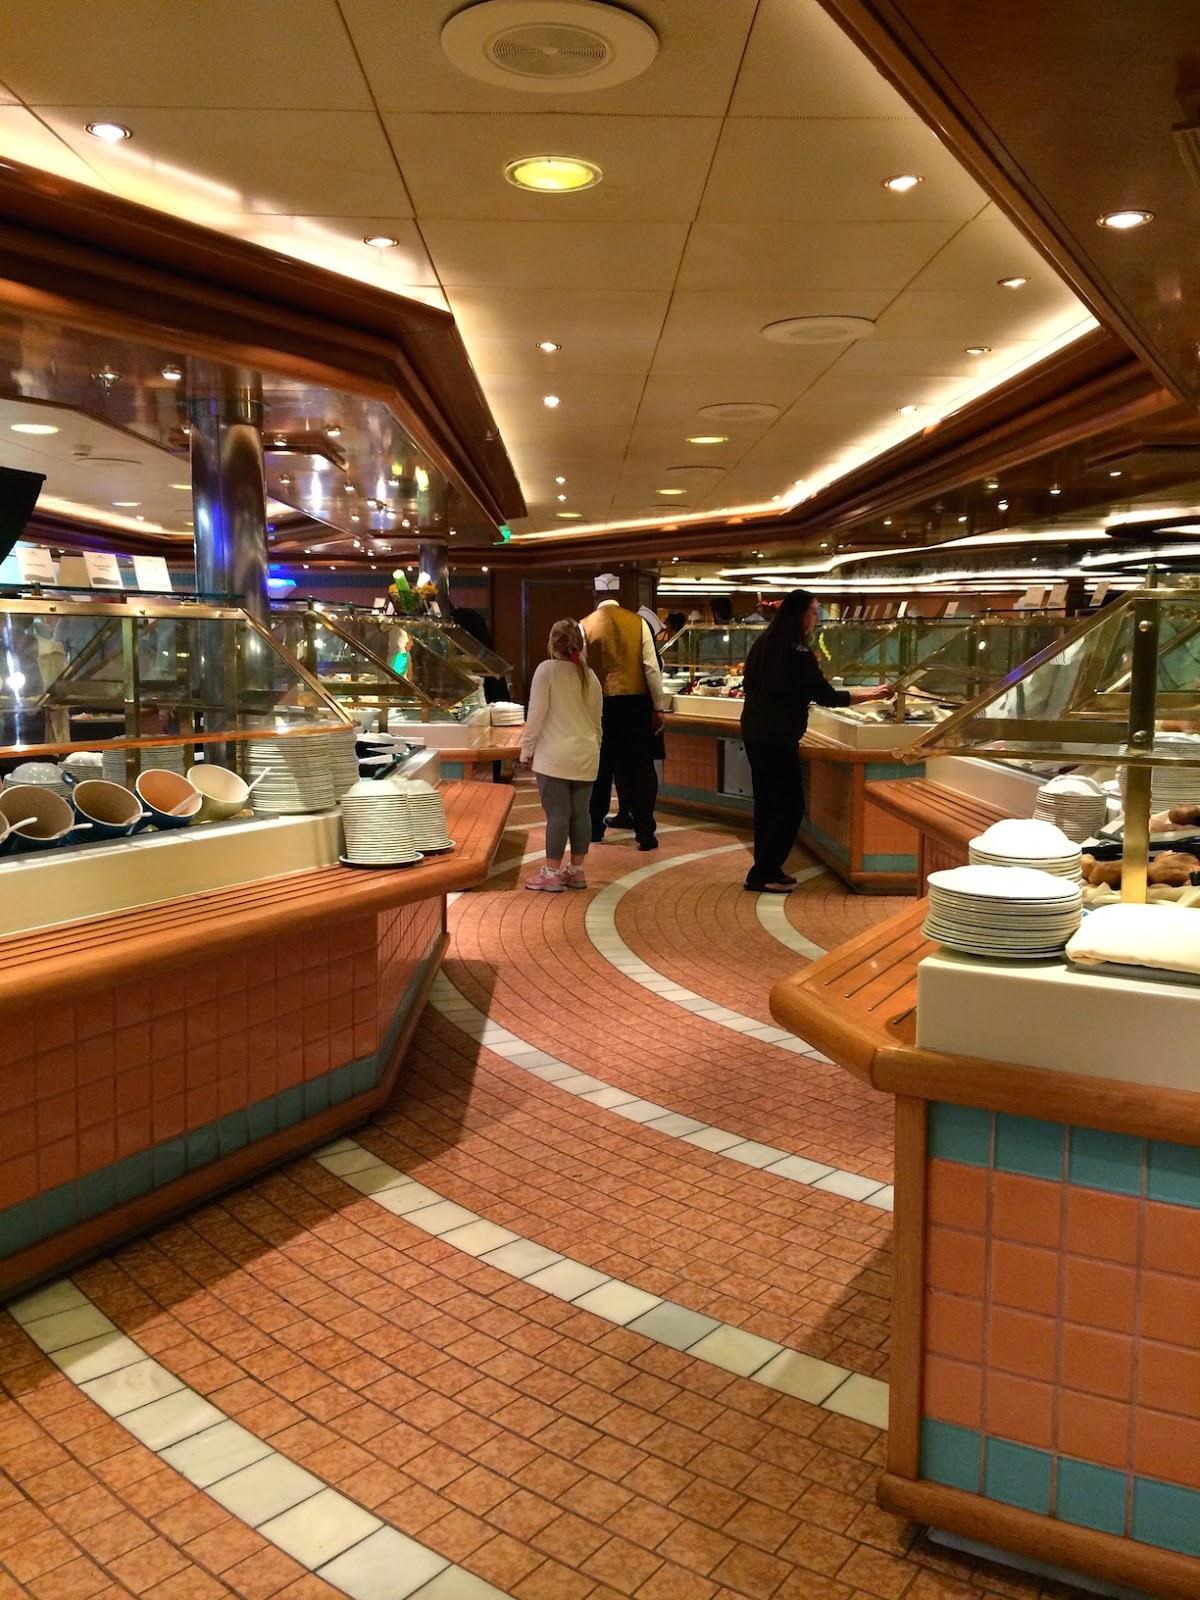 Princess Cruises Breakfast Buffet Any Tots